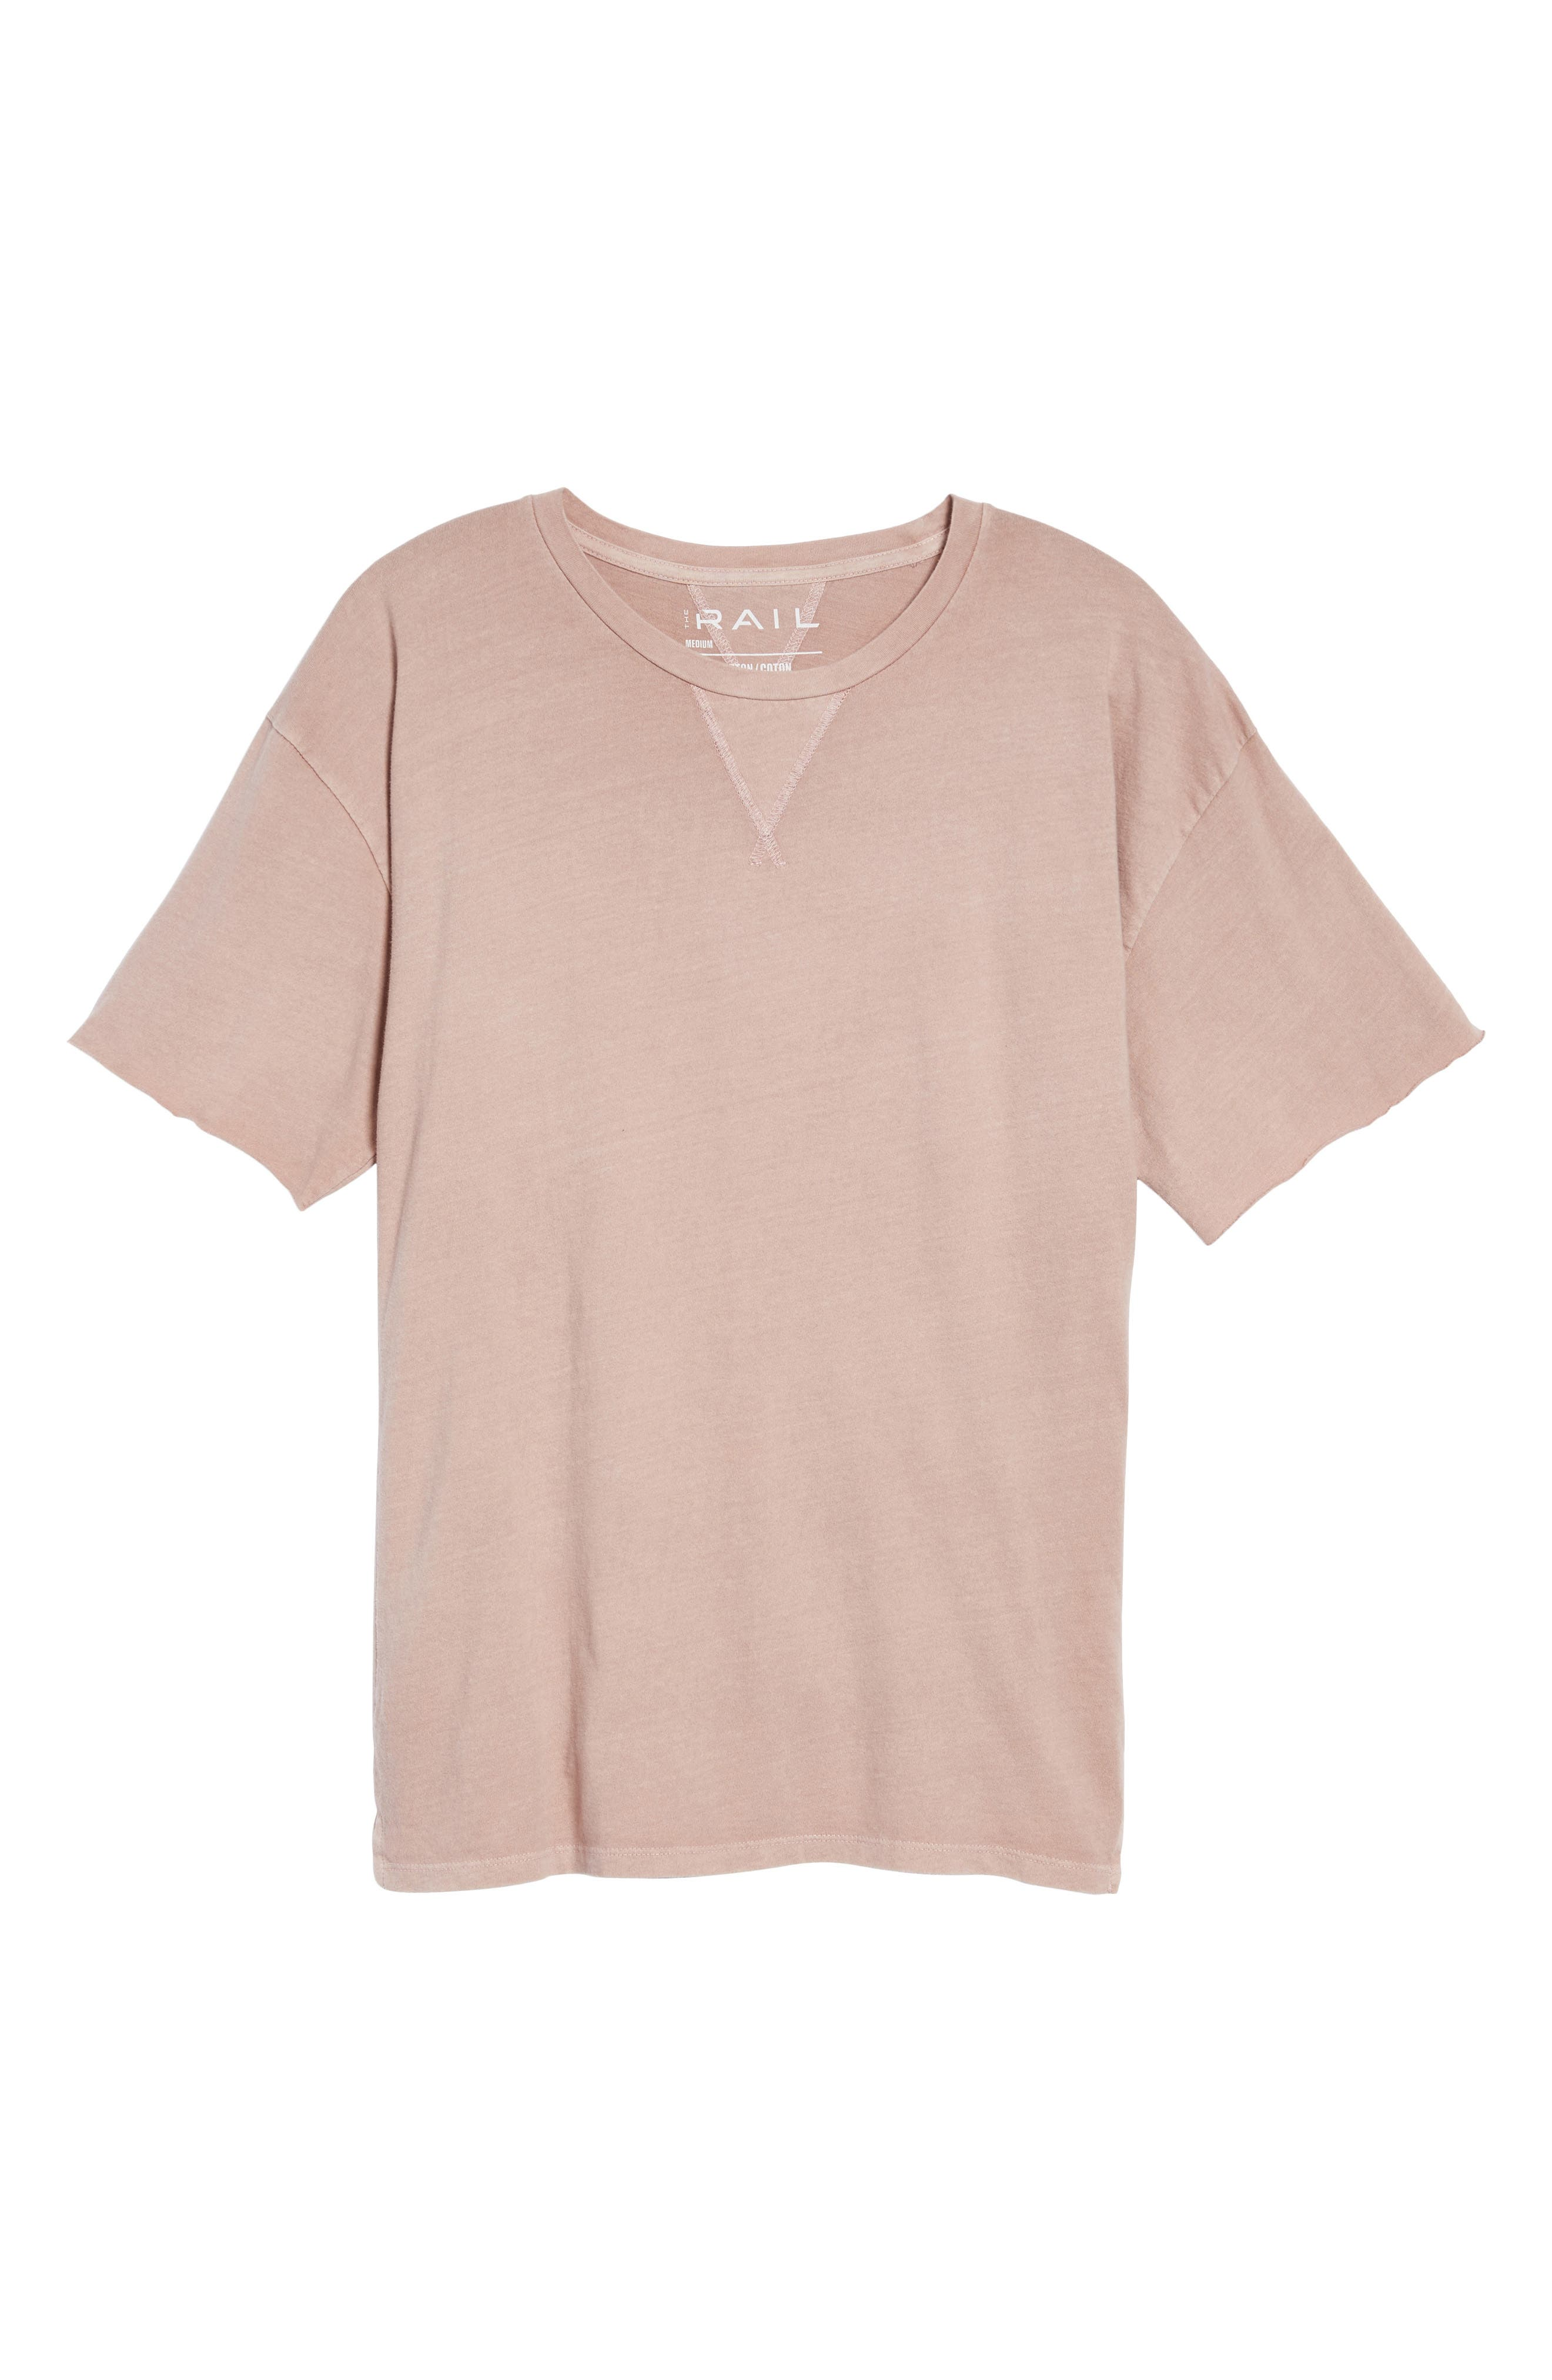 Alternate Image 6  - The Rail Mineral Wash T-Shirt